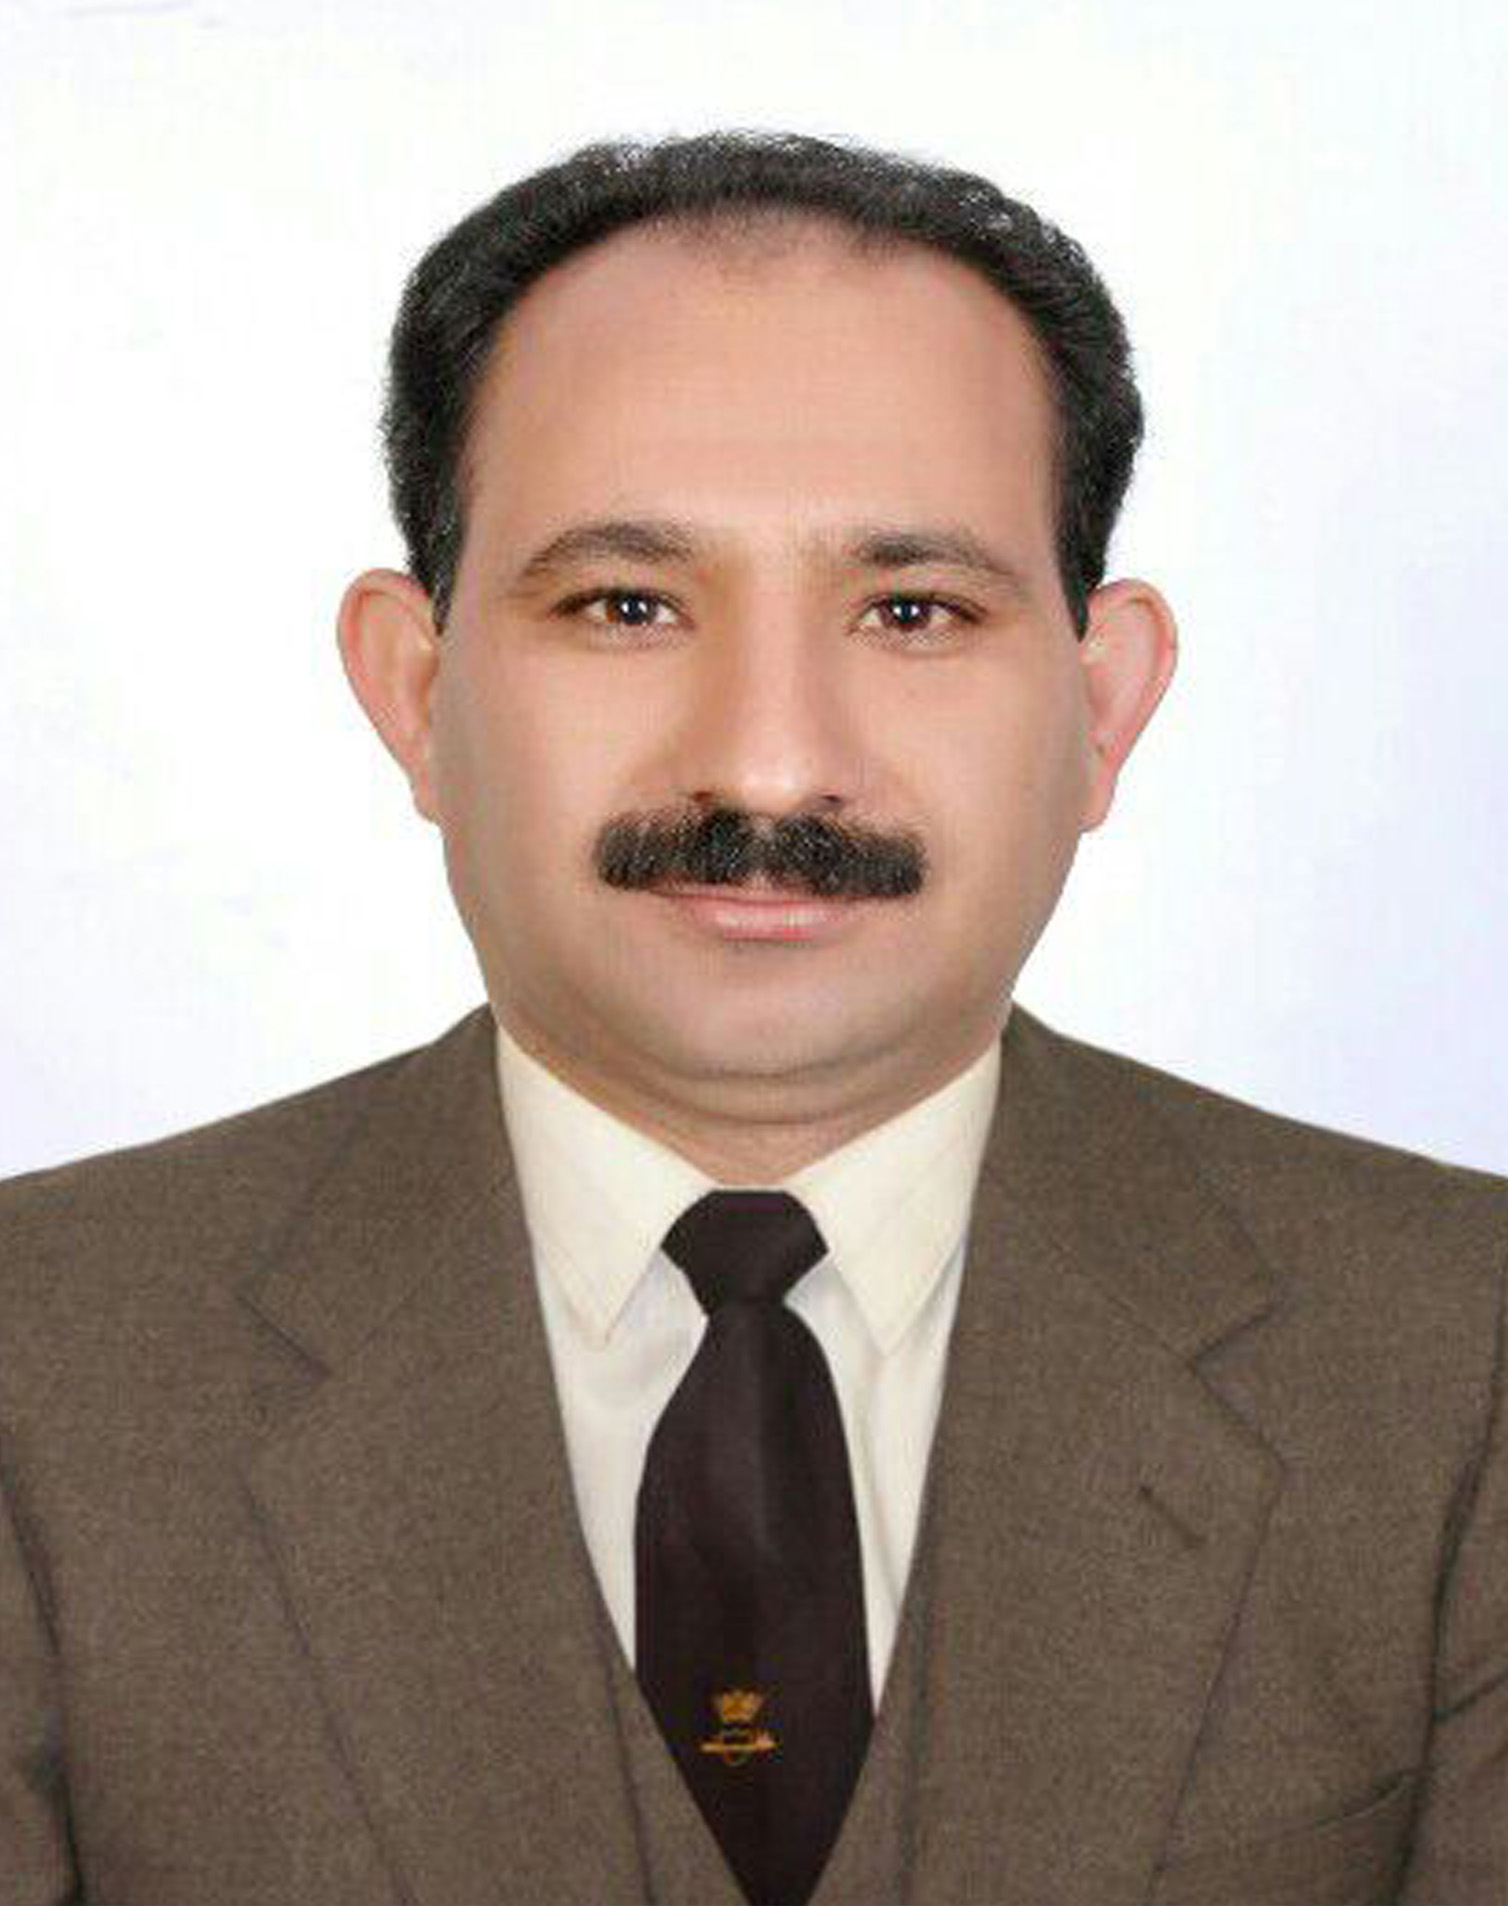 Abbas H. Hassin Alasadi